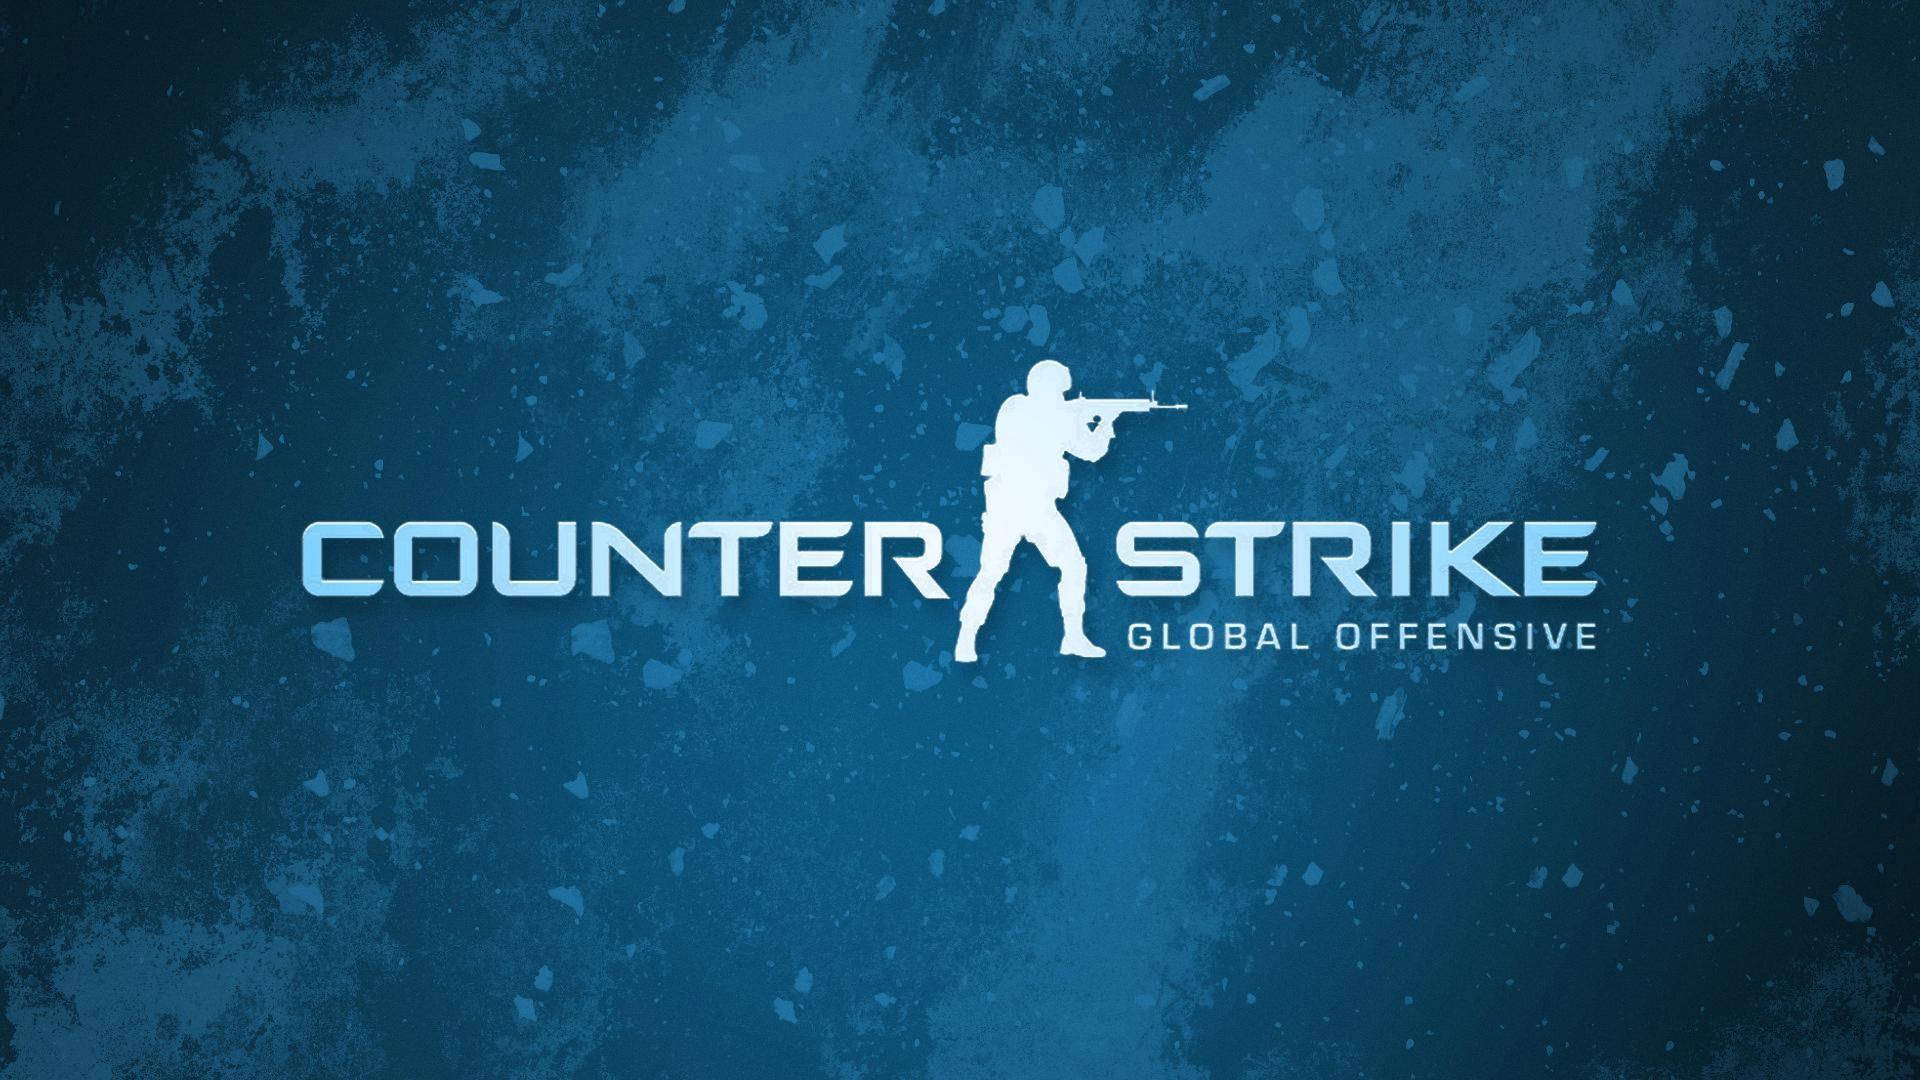 Counter Strike Global Offensive Logo – wallpaper.